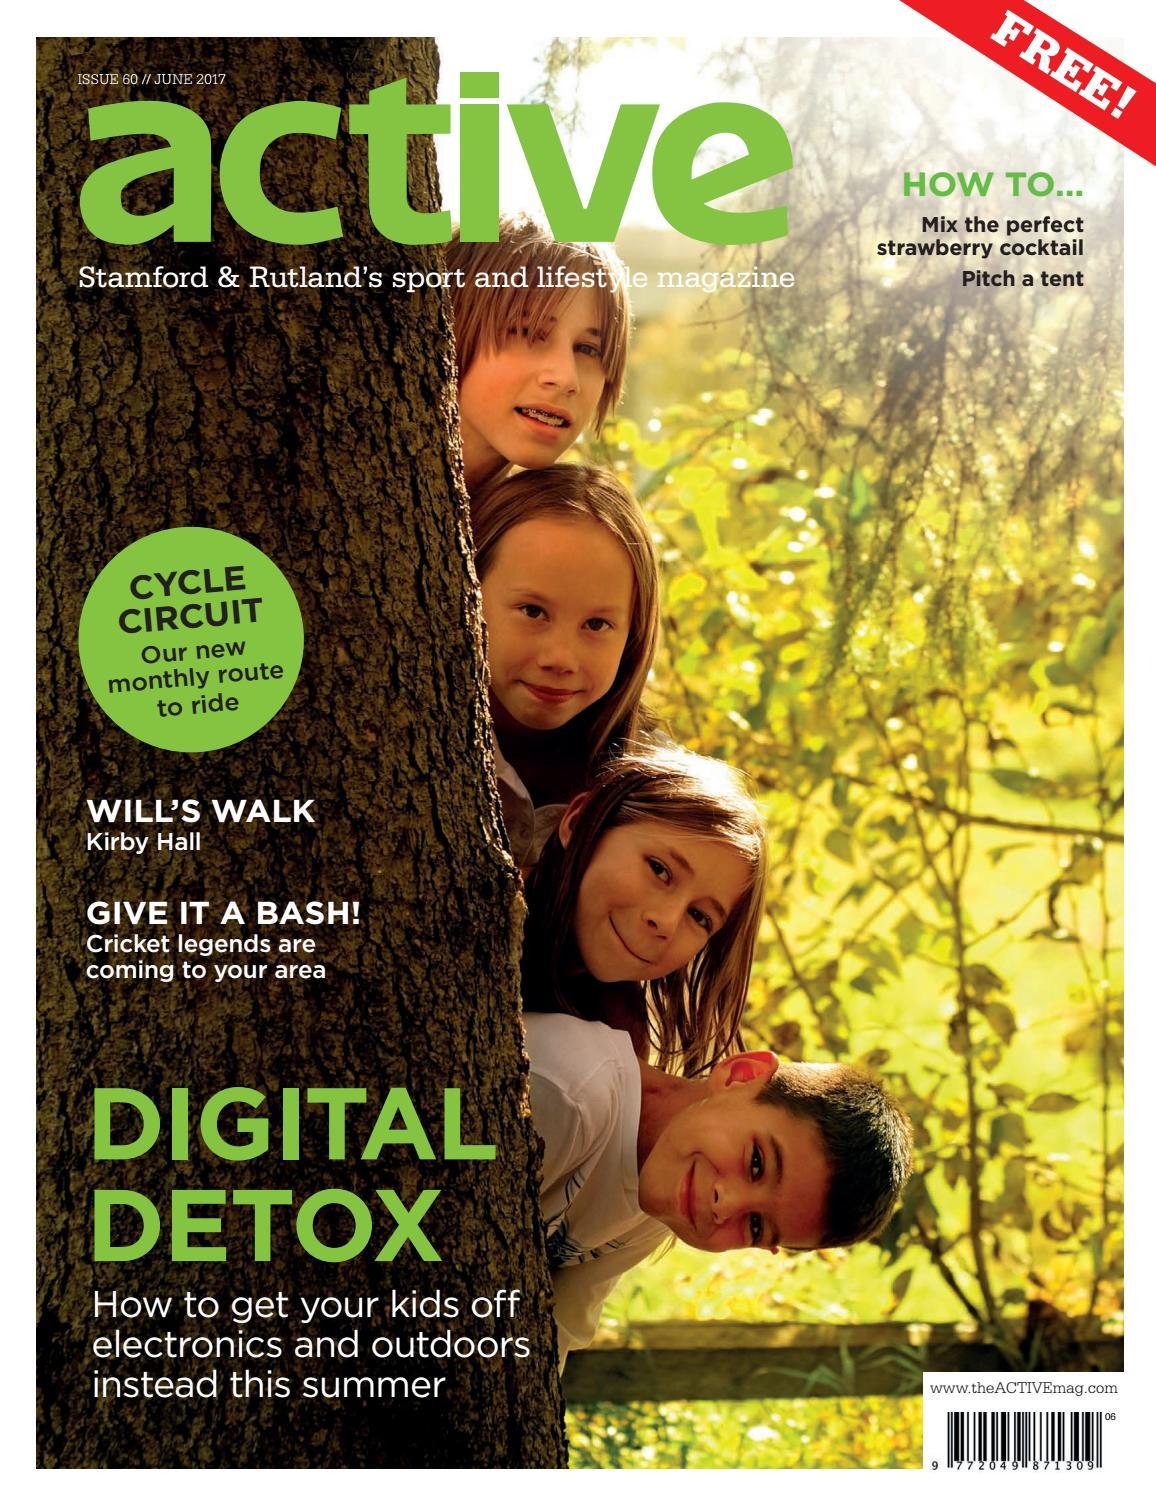 Active Magazine // Stamford u0026 Rutland // June 2017 by Active Magazine - issuu  sc 1 st  Issuu & Active Magazine // Stamford u0026 Rutland // June 2017 by Active ...